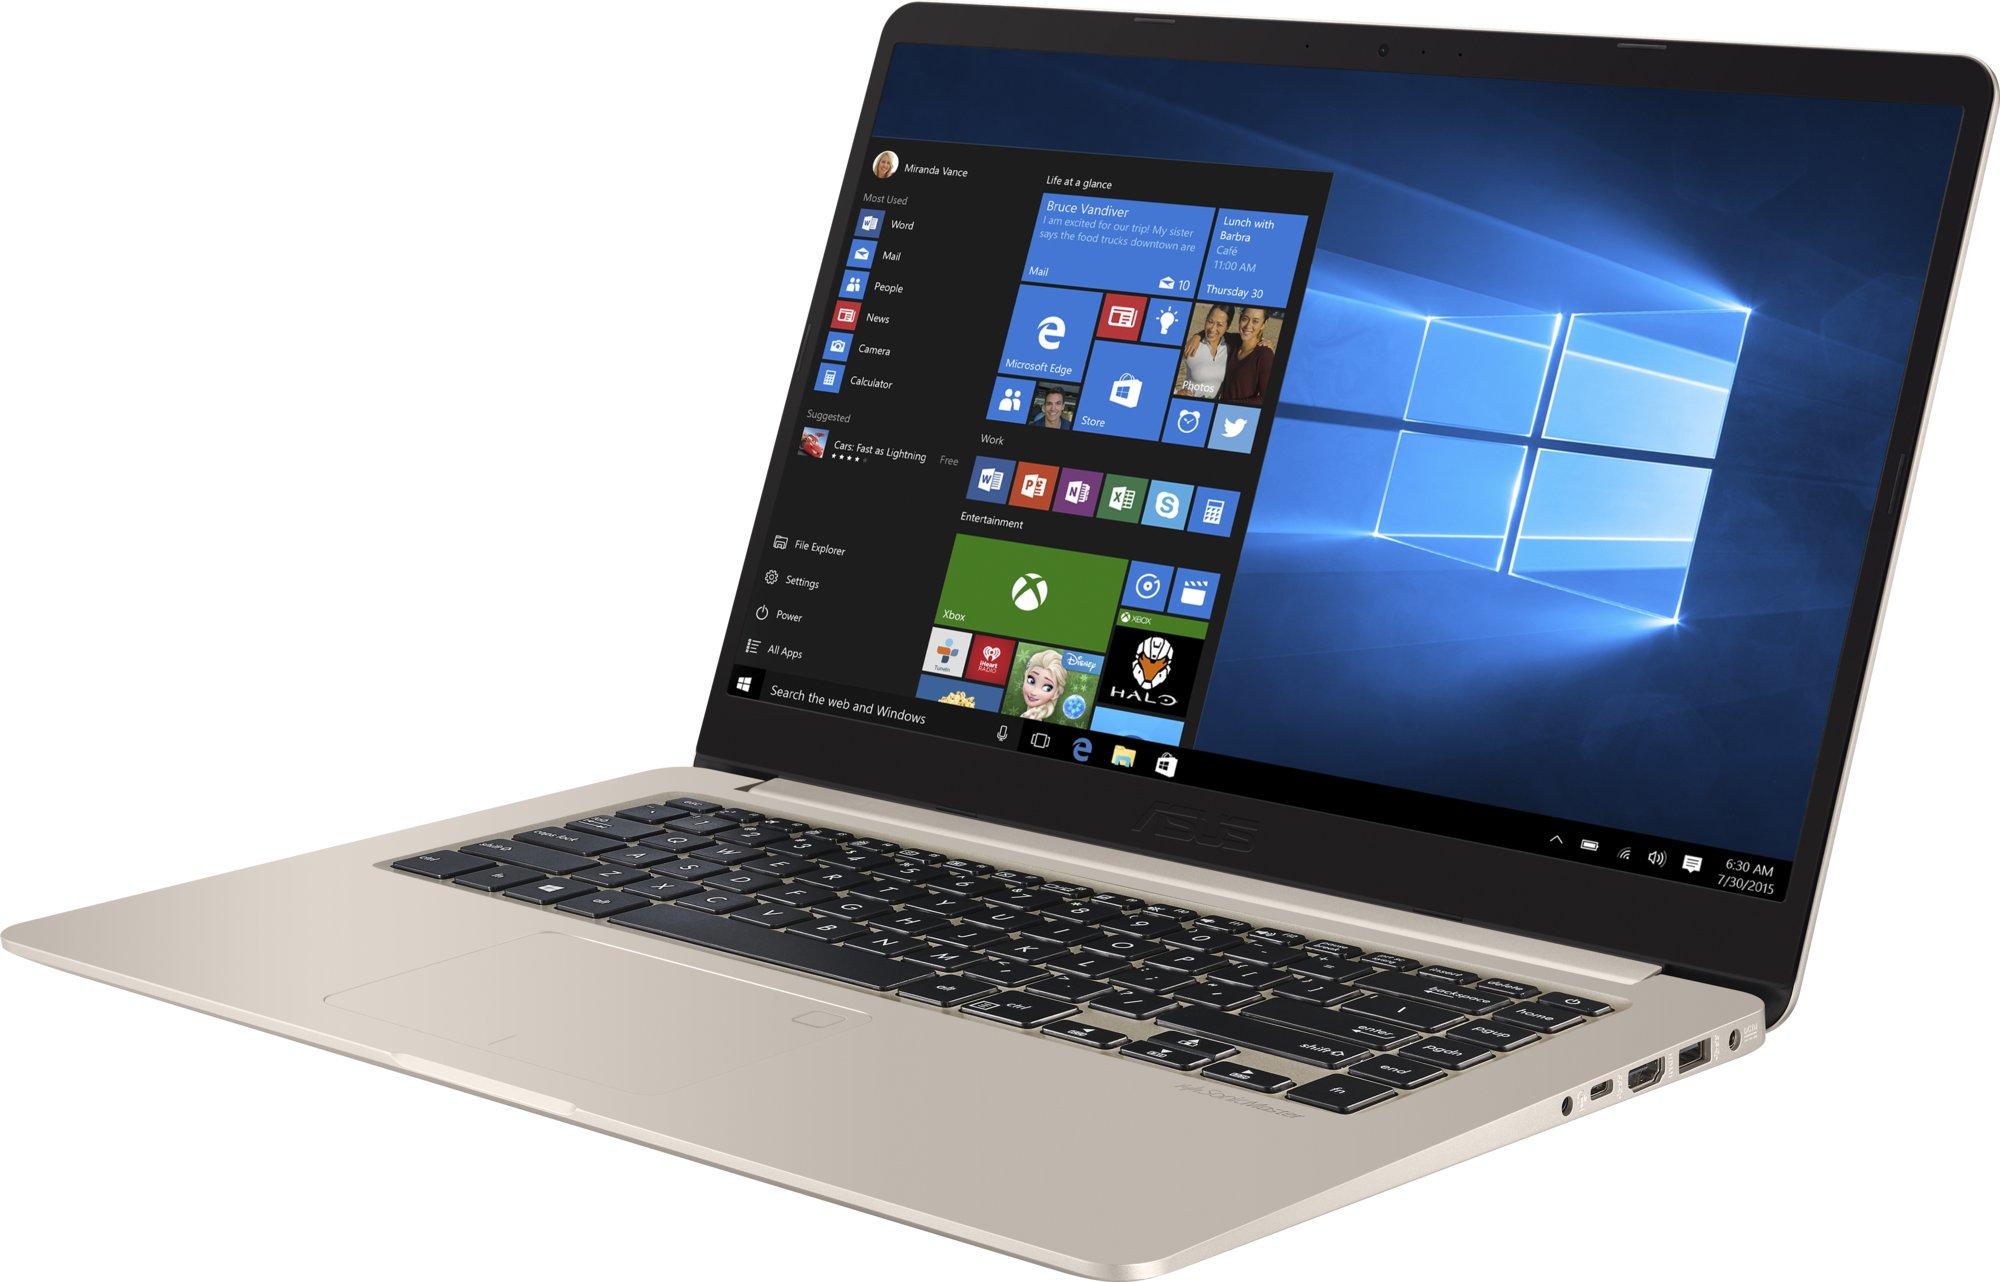 Asus VivoBook S510UF-BR239T